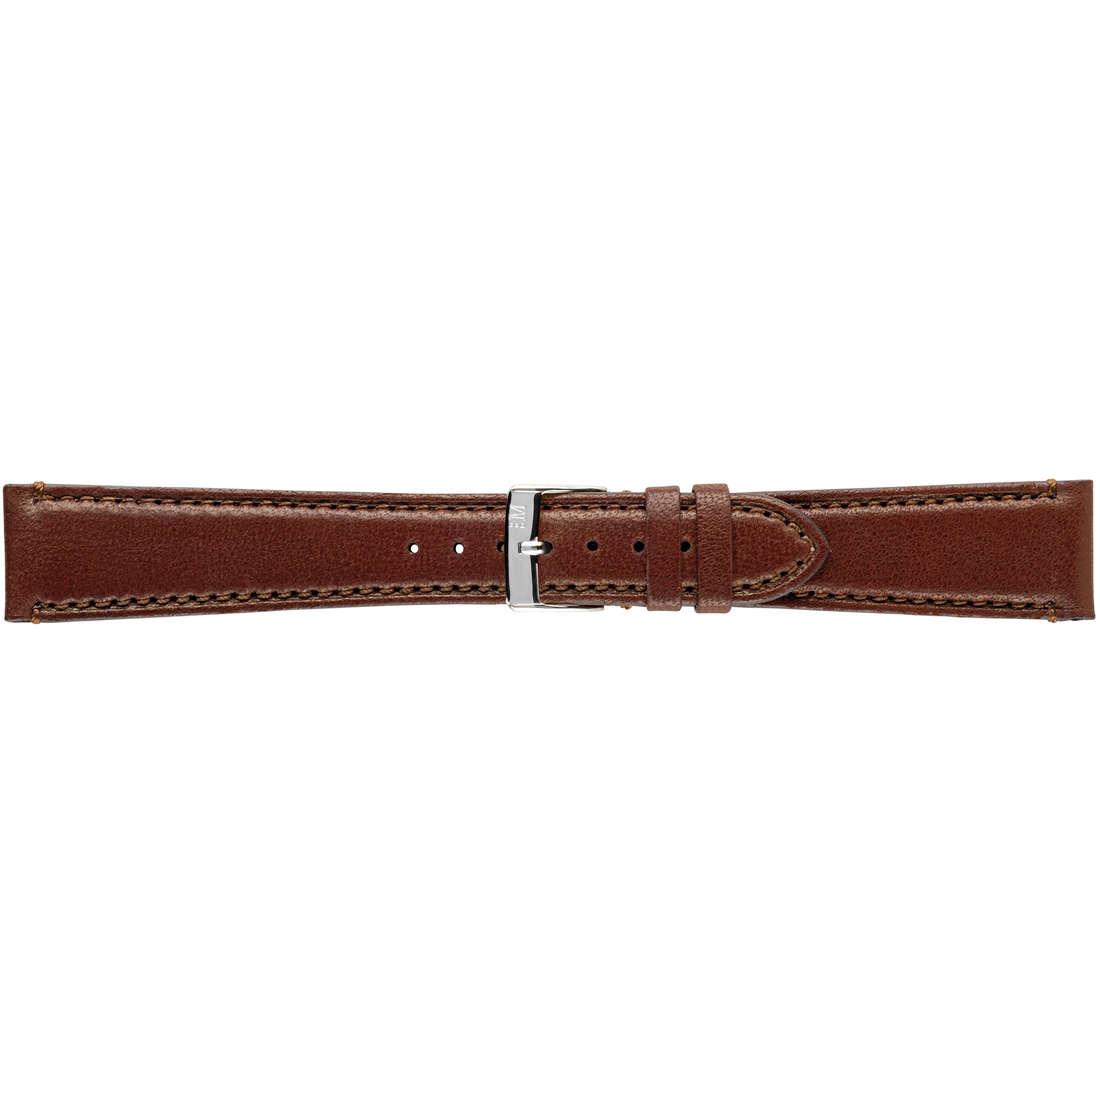 watch watch bands watch straps man Morellato Manufatti A01X3495006030CR14